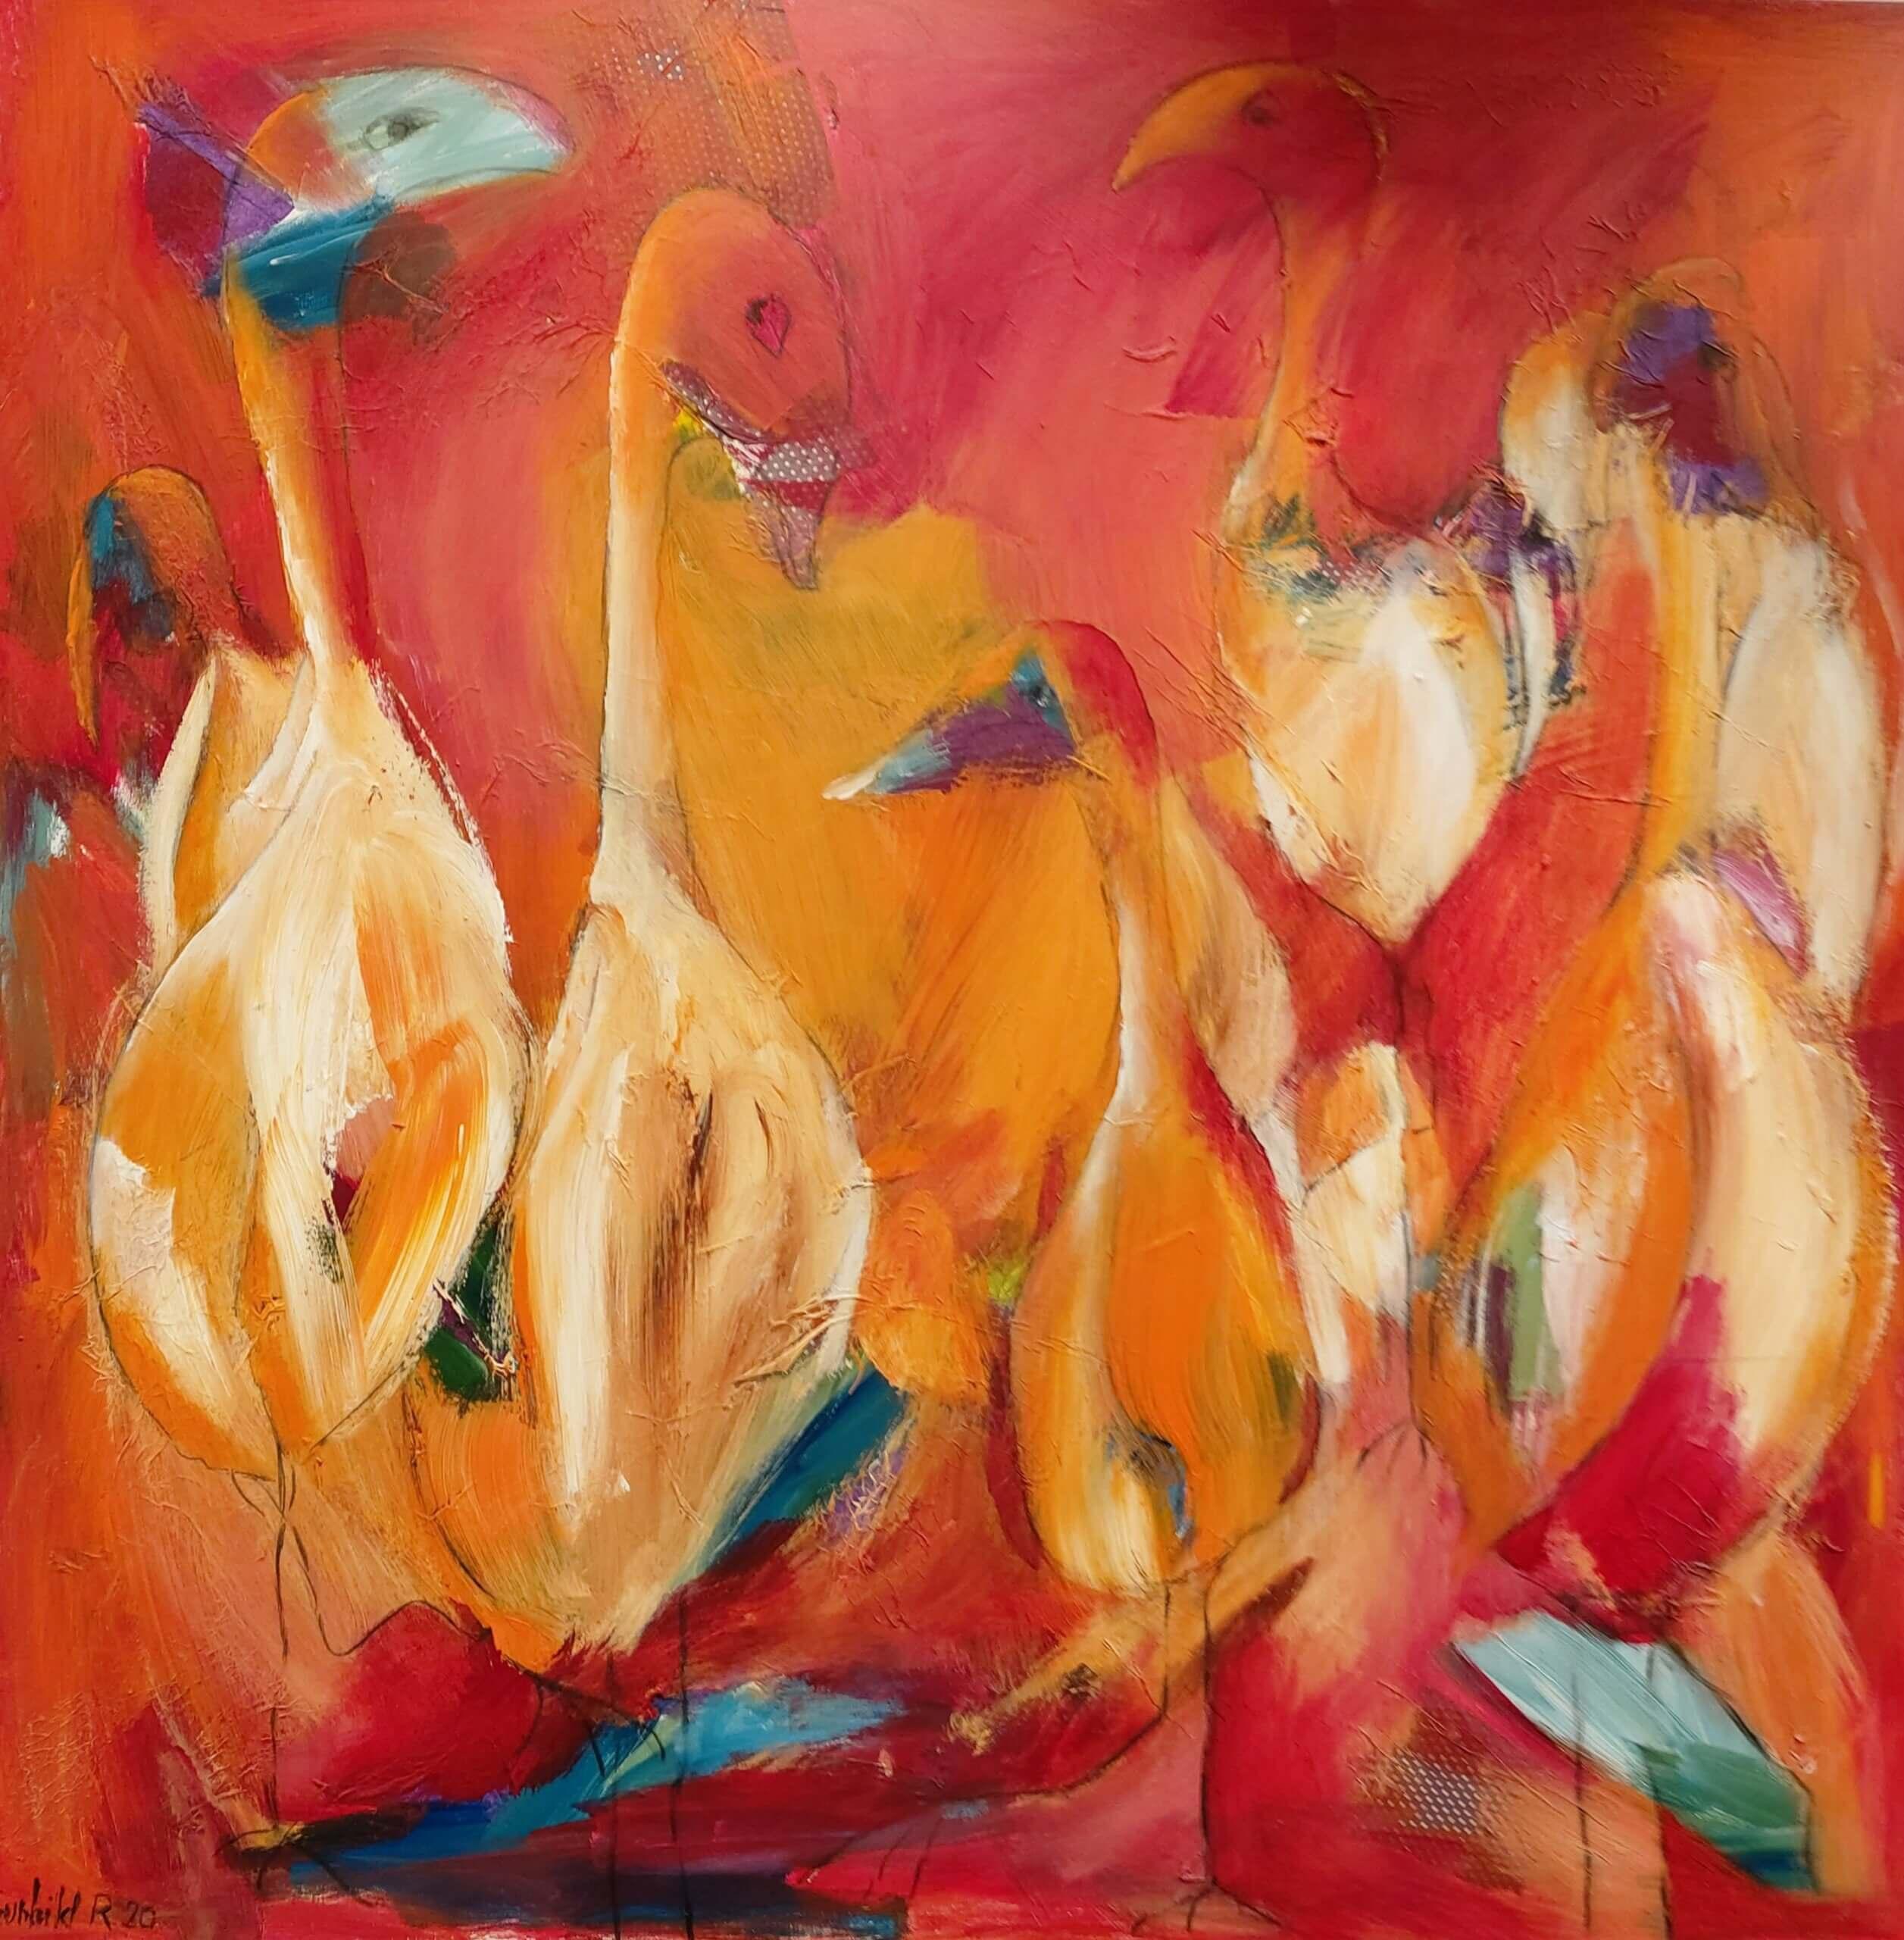 Finurlige fugle maleri af Gunhild Rasmussen